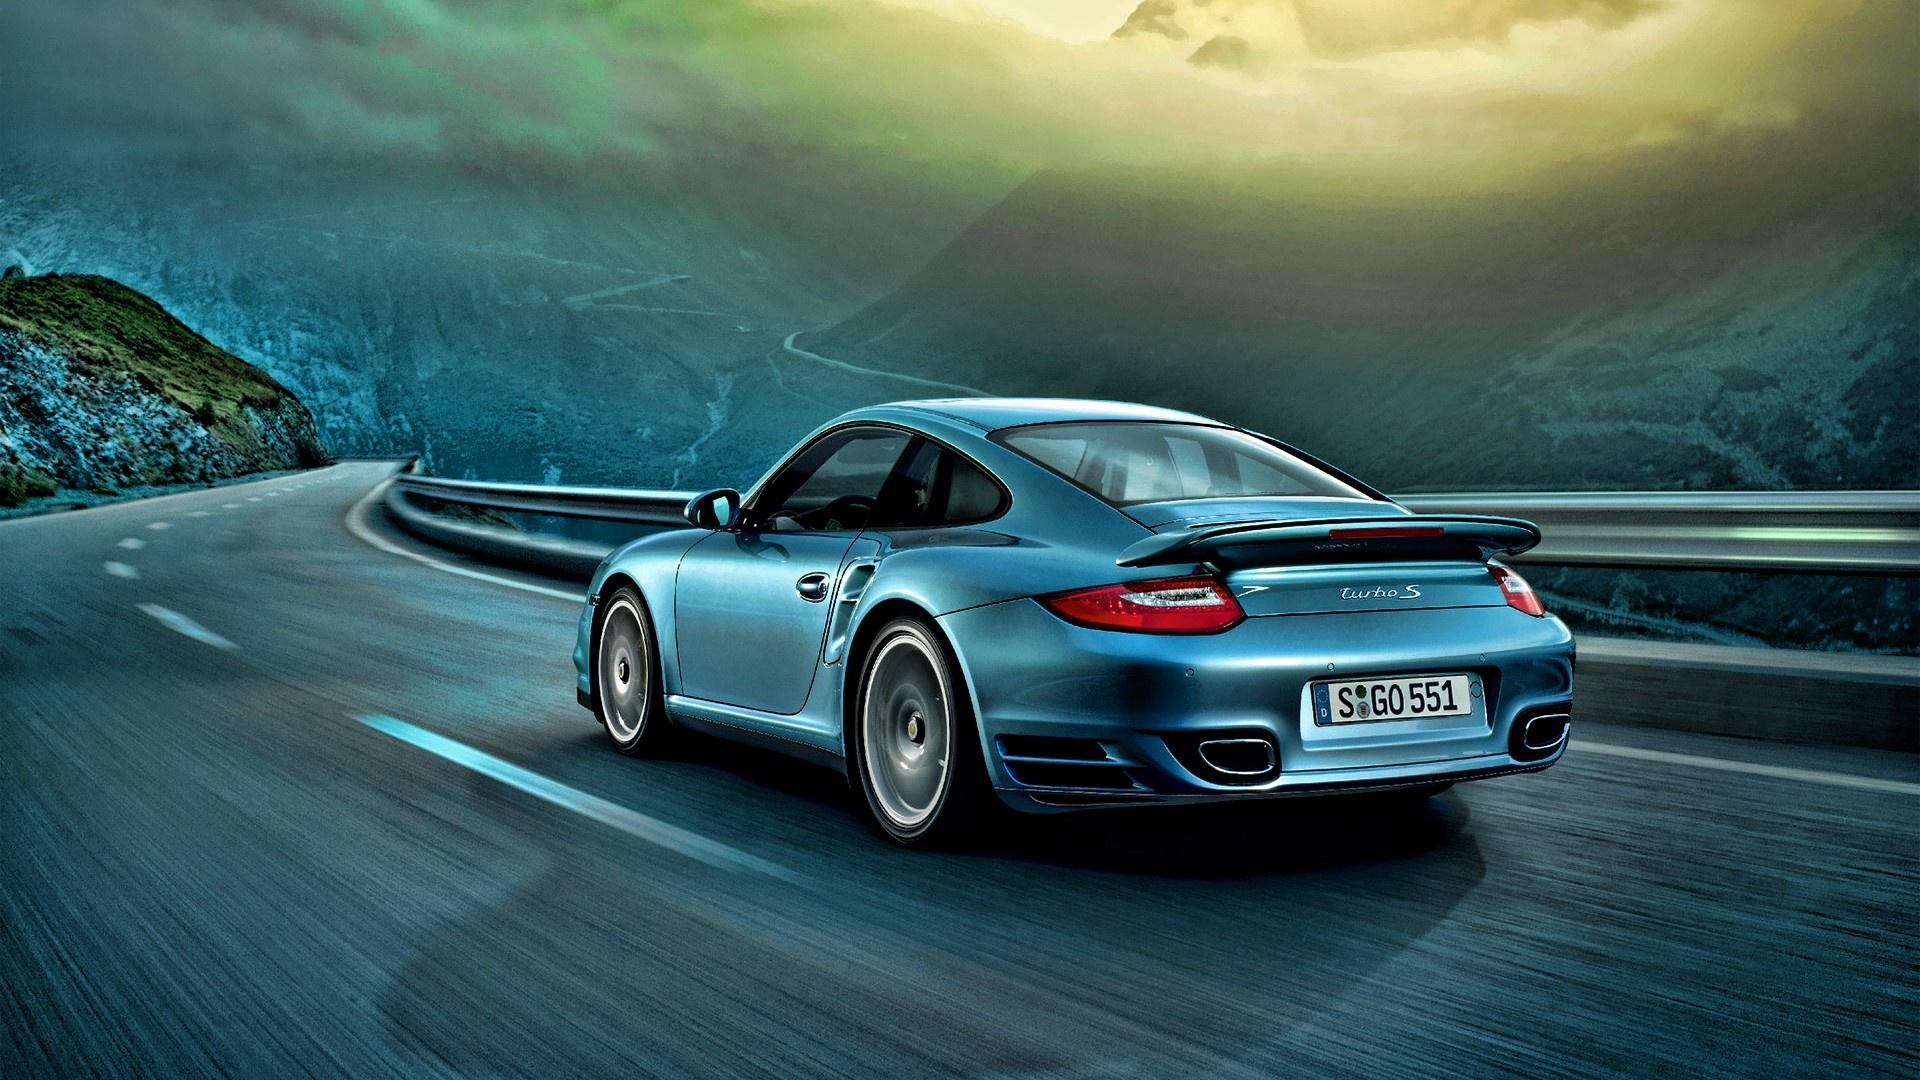 Porsche 911 Turbo S Wallpapers   1920x1080   667319 1920x1080